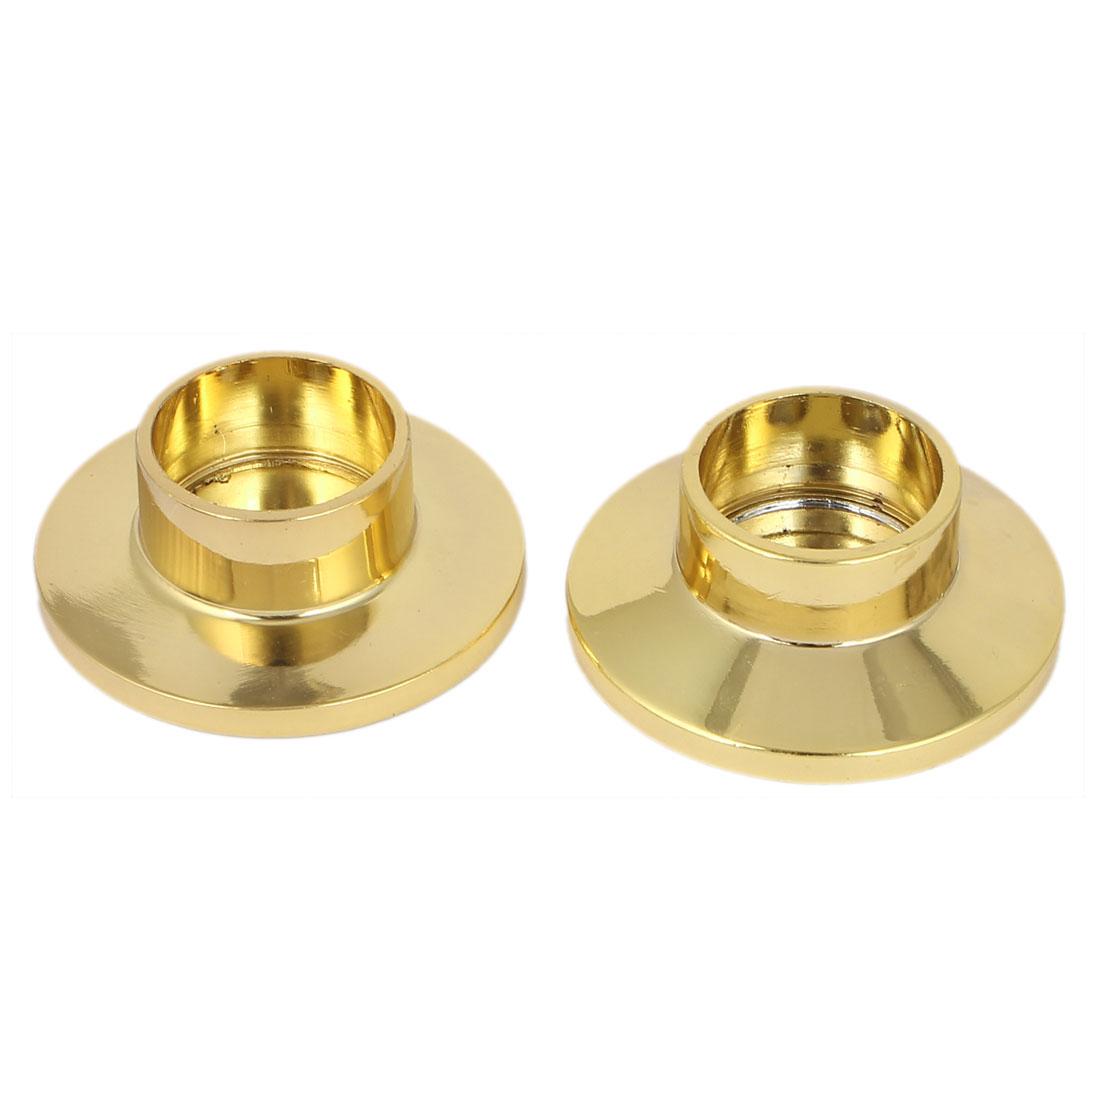 Metal Wardrobe Hanging Rail Rod End Support Bracket Socket Gold Tone 2pcs